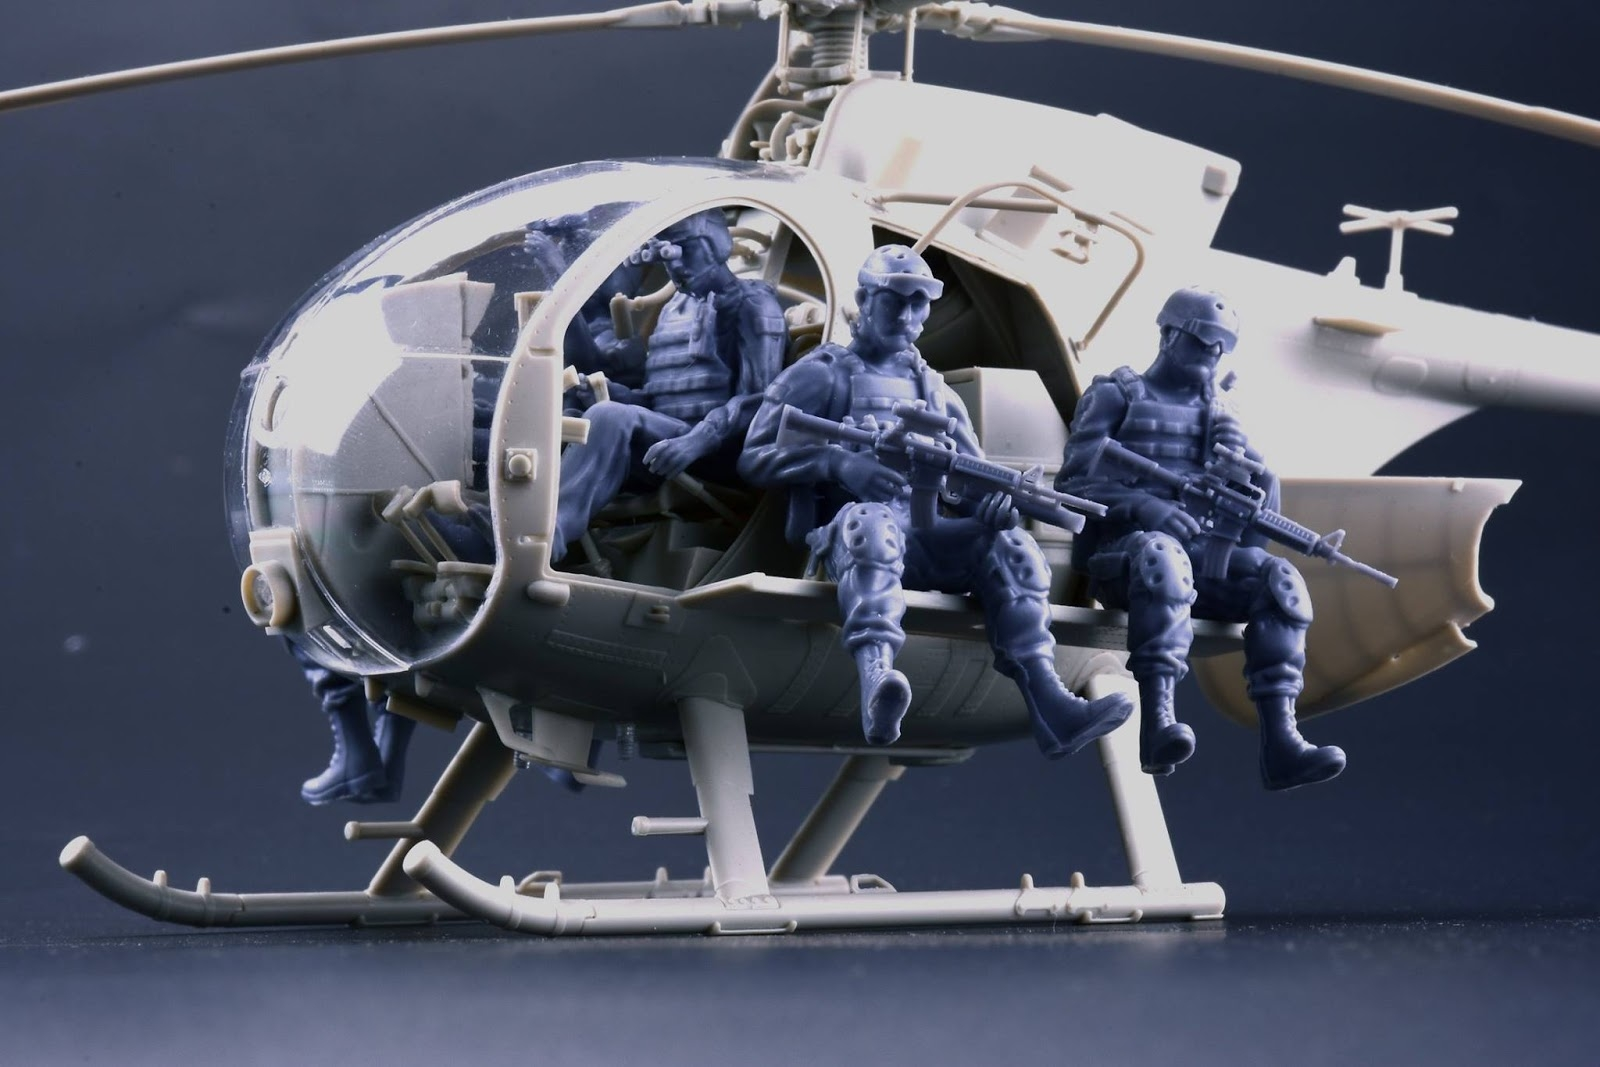 Kitty Hawk Model 1/35 Hughes AH-6J/MH-6J Little Bird Nightstalker with Figures # 50004